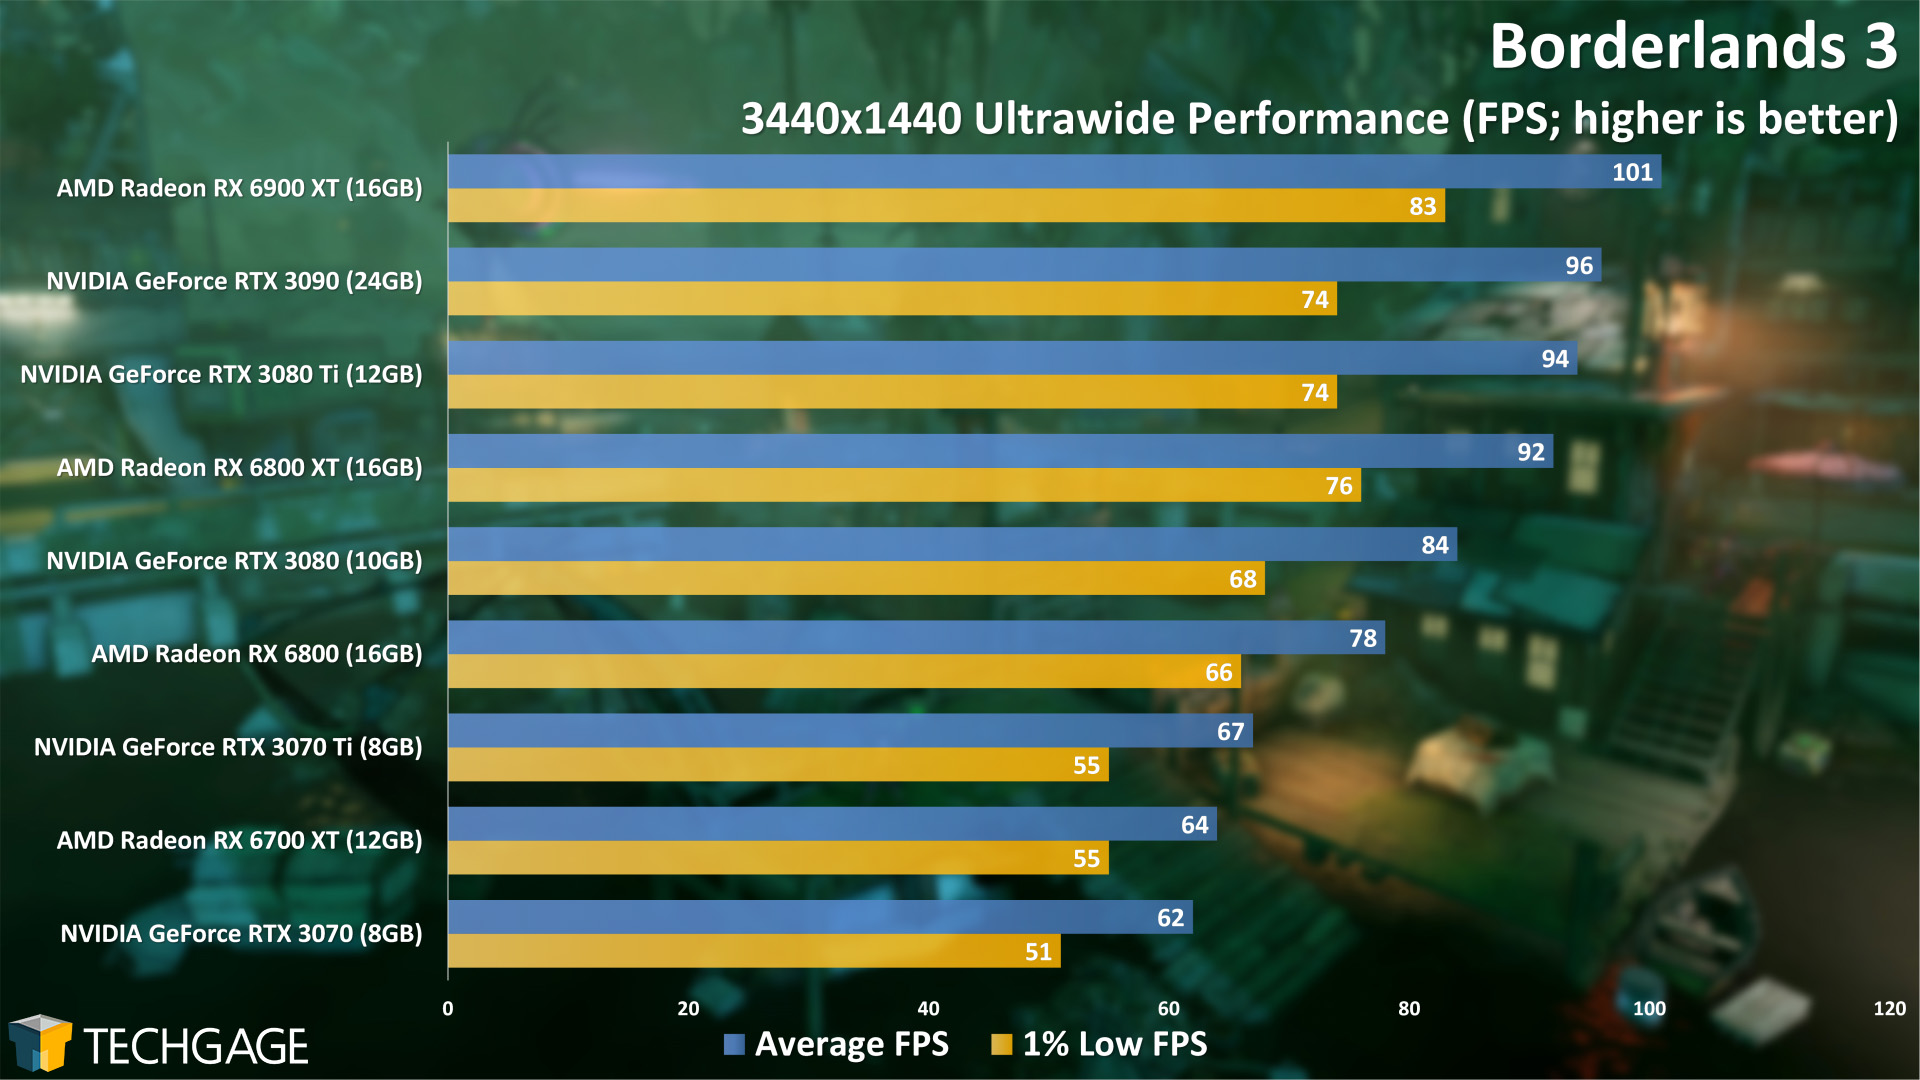 Borderlands 3 - 3440x1440 Ultrawide Performance (NVIDIA GeForce RTX 3070 Ti)